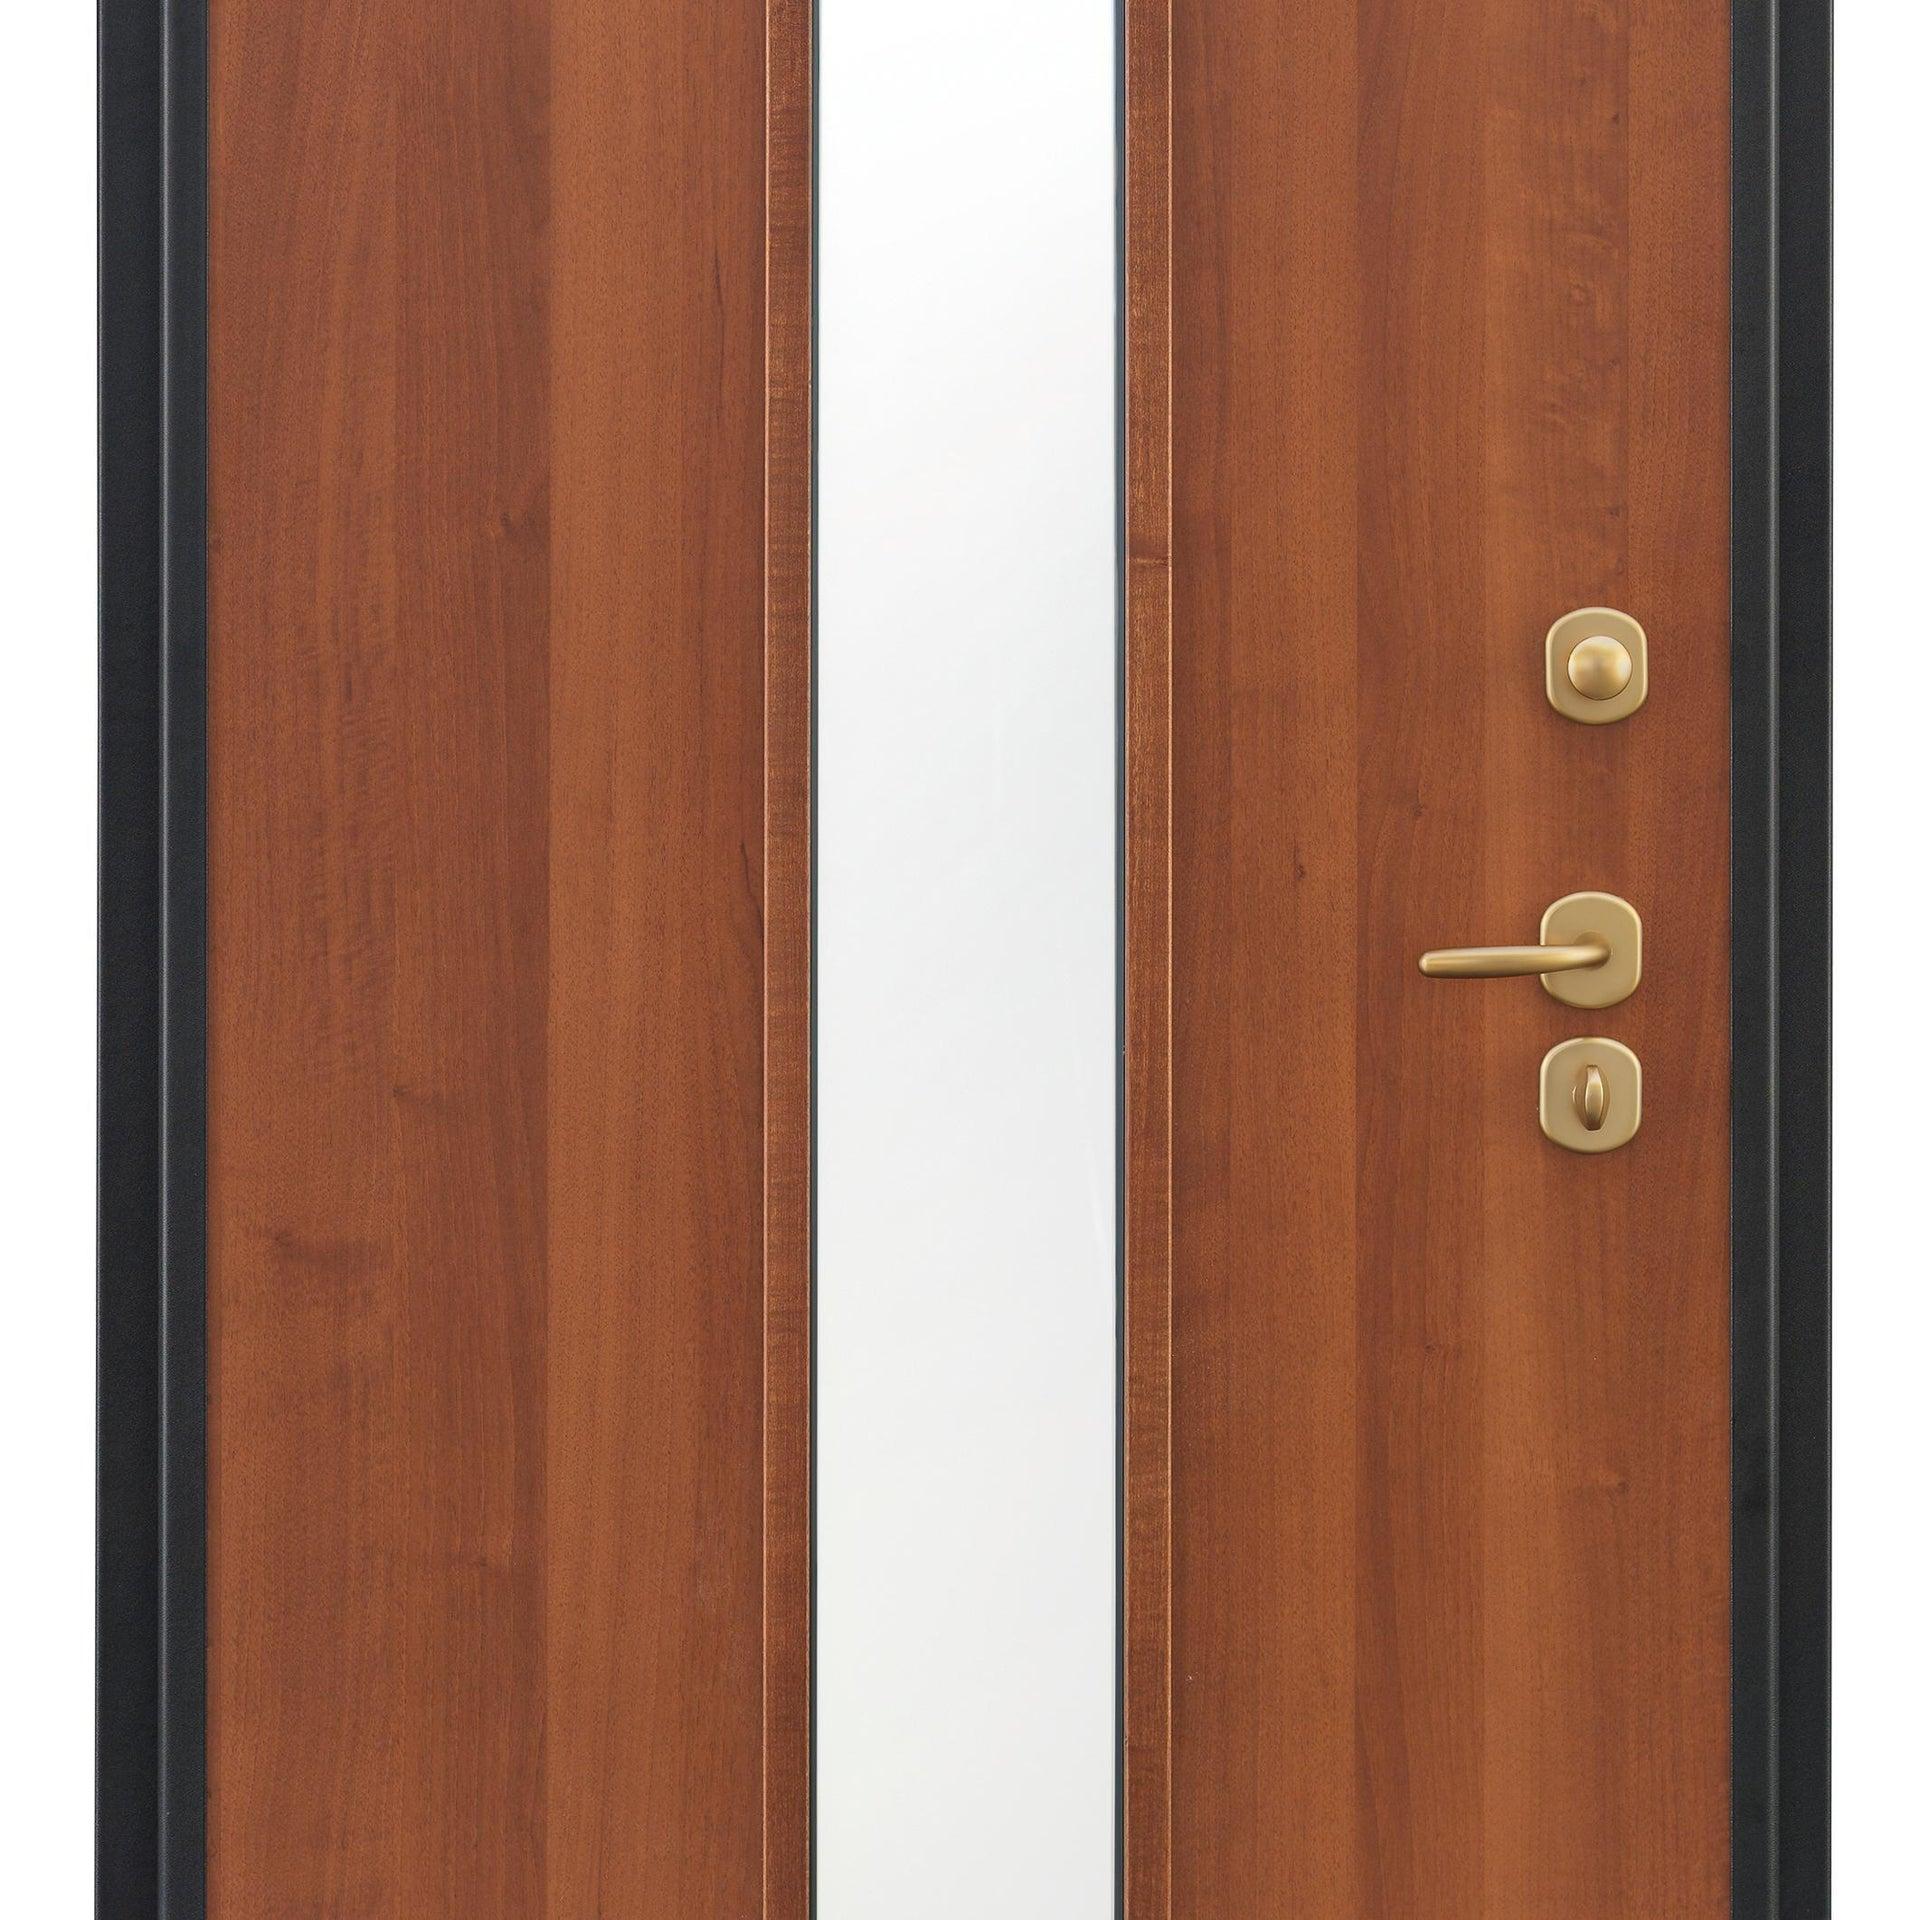 Porta blindata Mirror noce L 90 x H 210 cm destra - 8